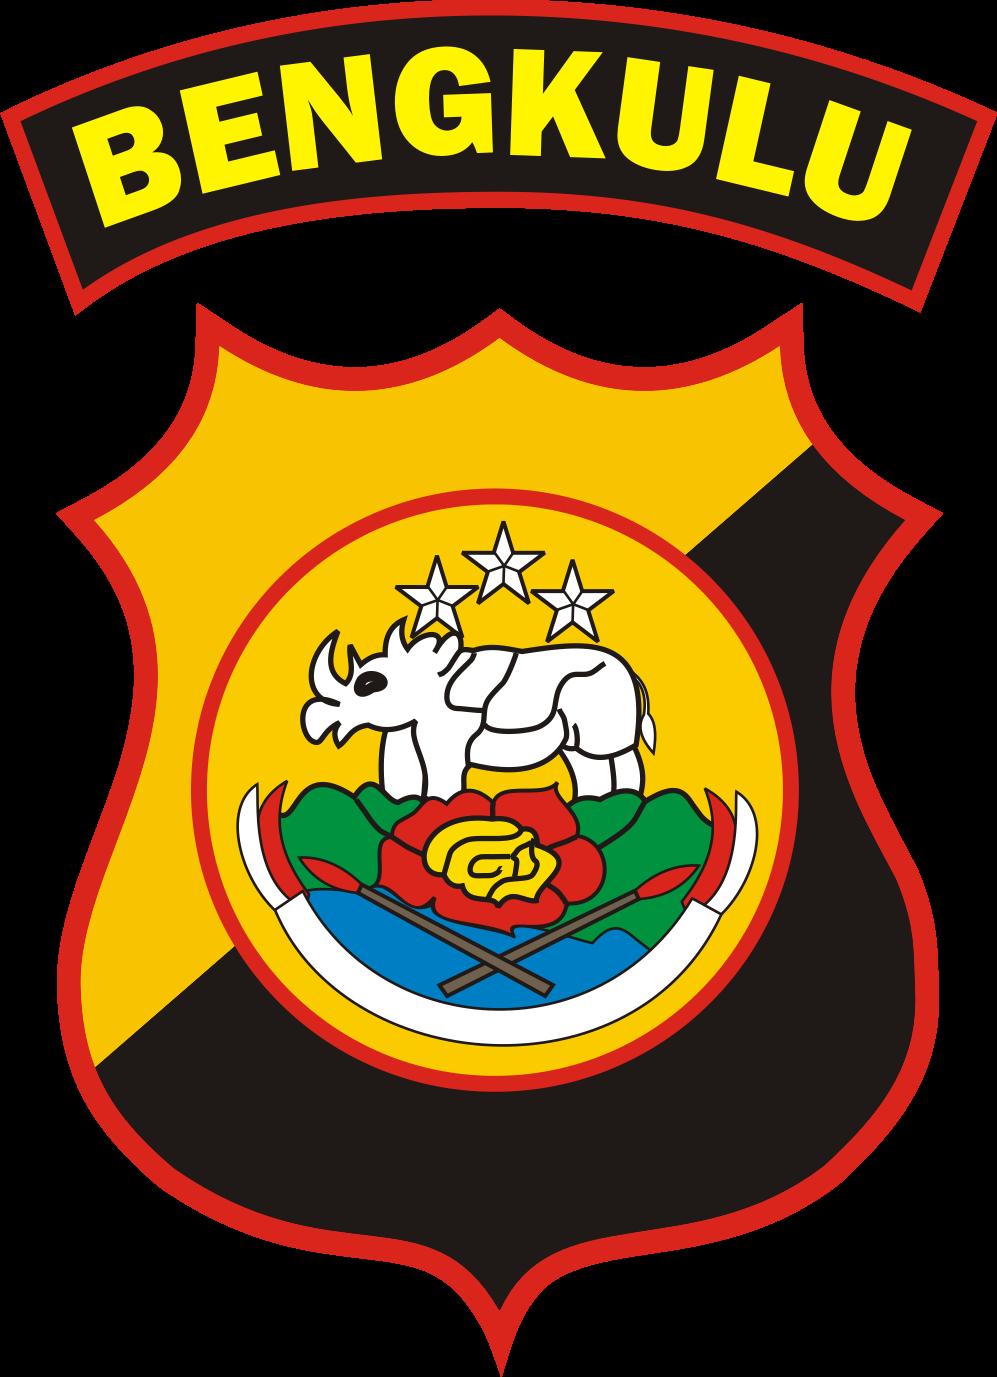 logo Polda Bengkulu - Kumpulan Logo Indonesia